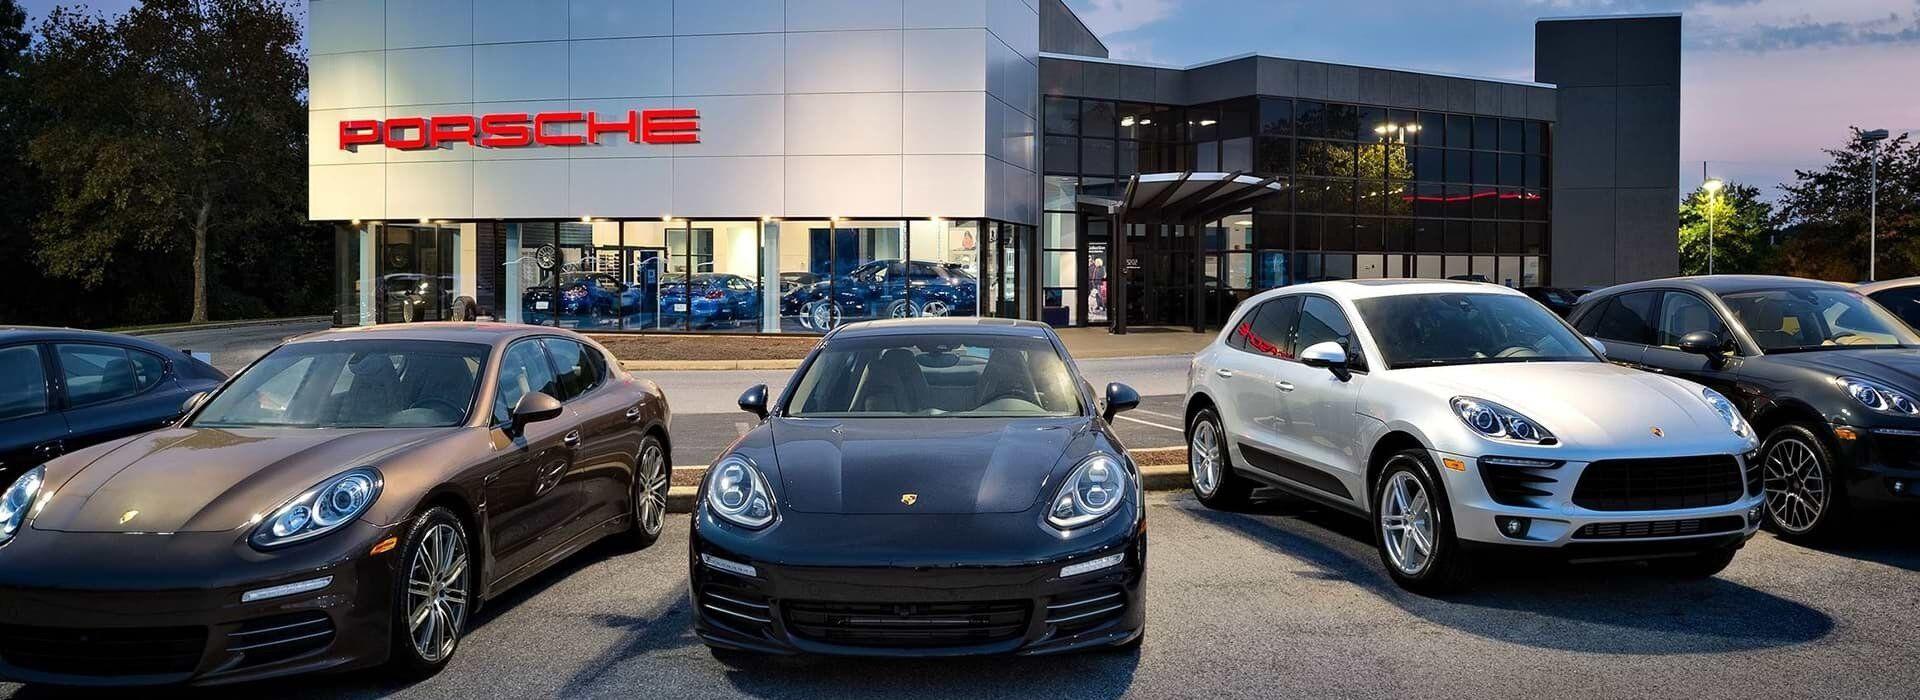 Car Dealerships In Delaware >> Porsche Dealership Newark De Used Cars Porsche Delaware